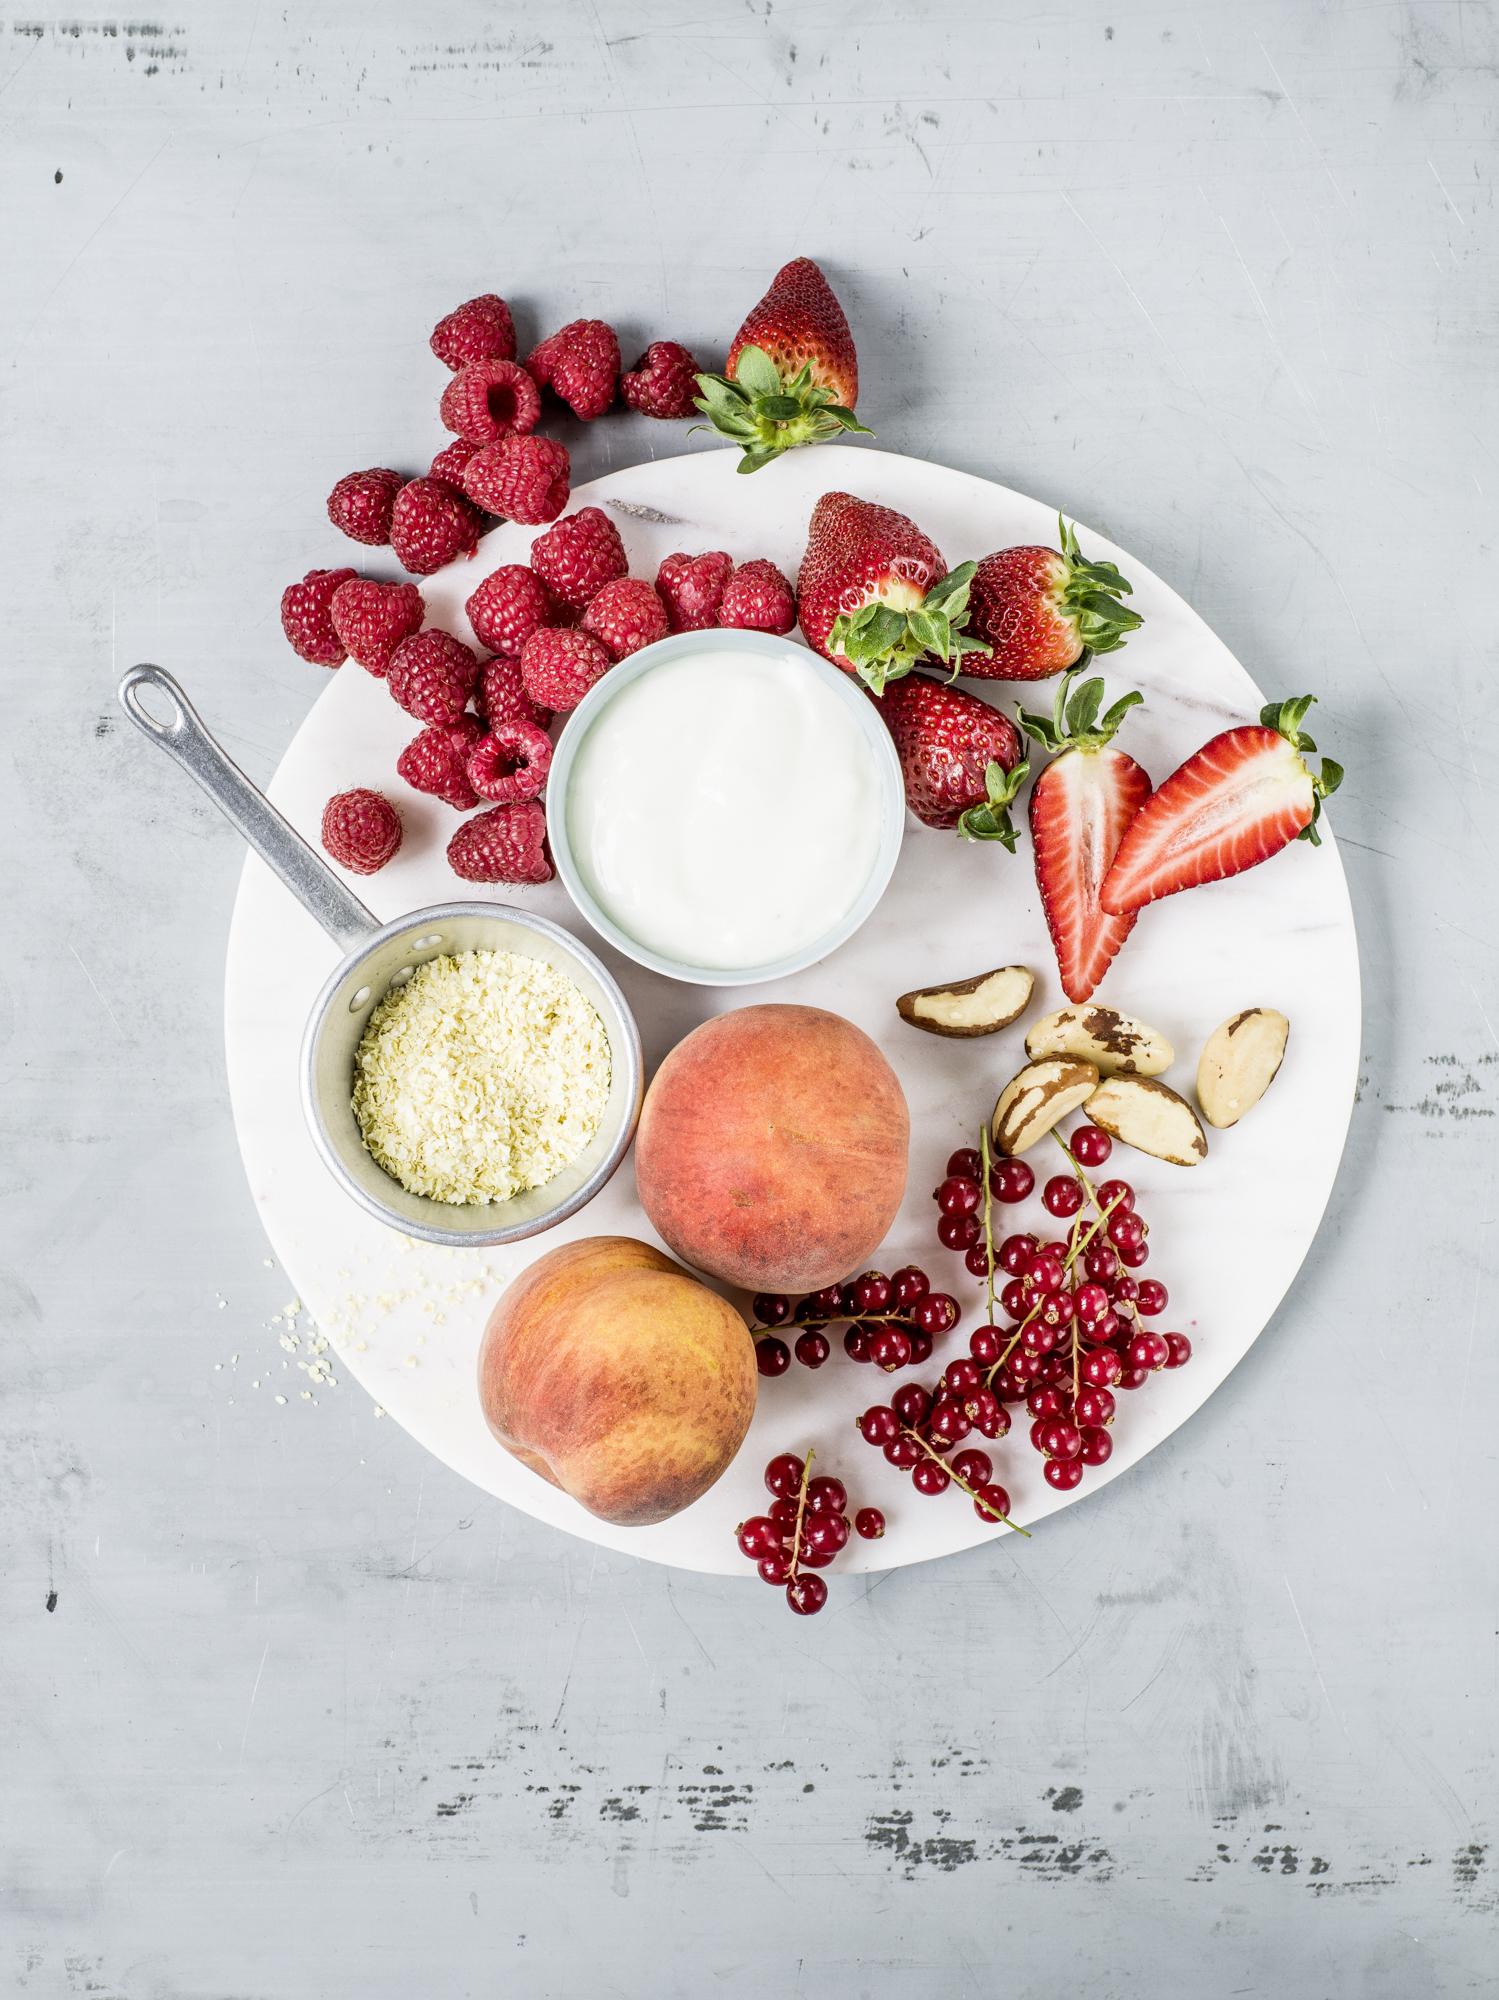 Food-Fotografie Microgreens, Stefan Schmidlin Fotograf Basel; Bild 18.jpg